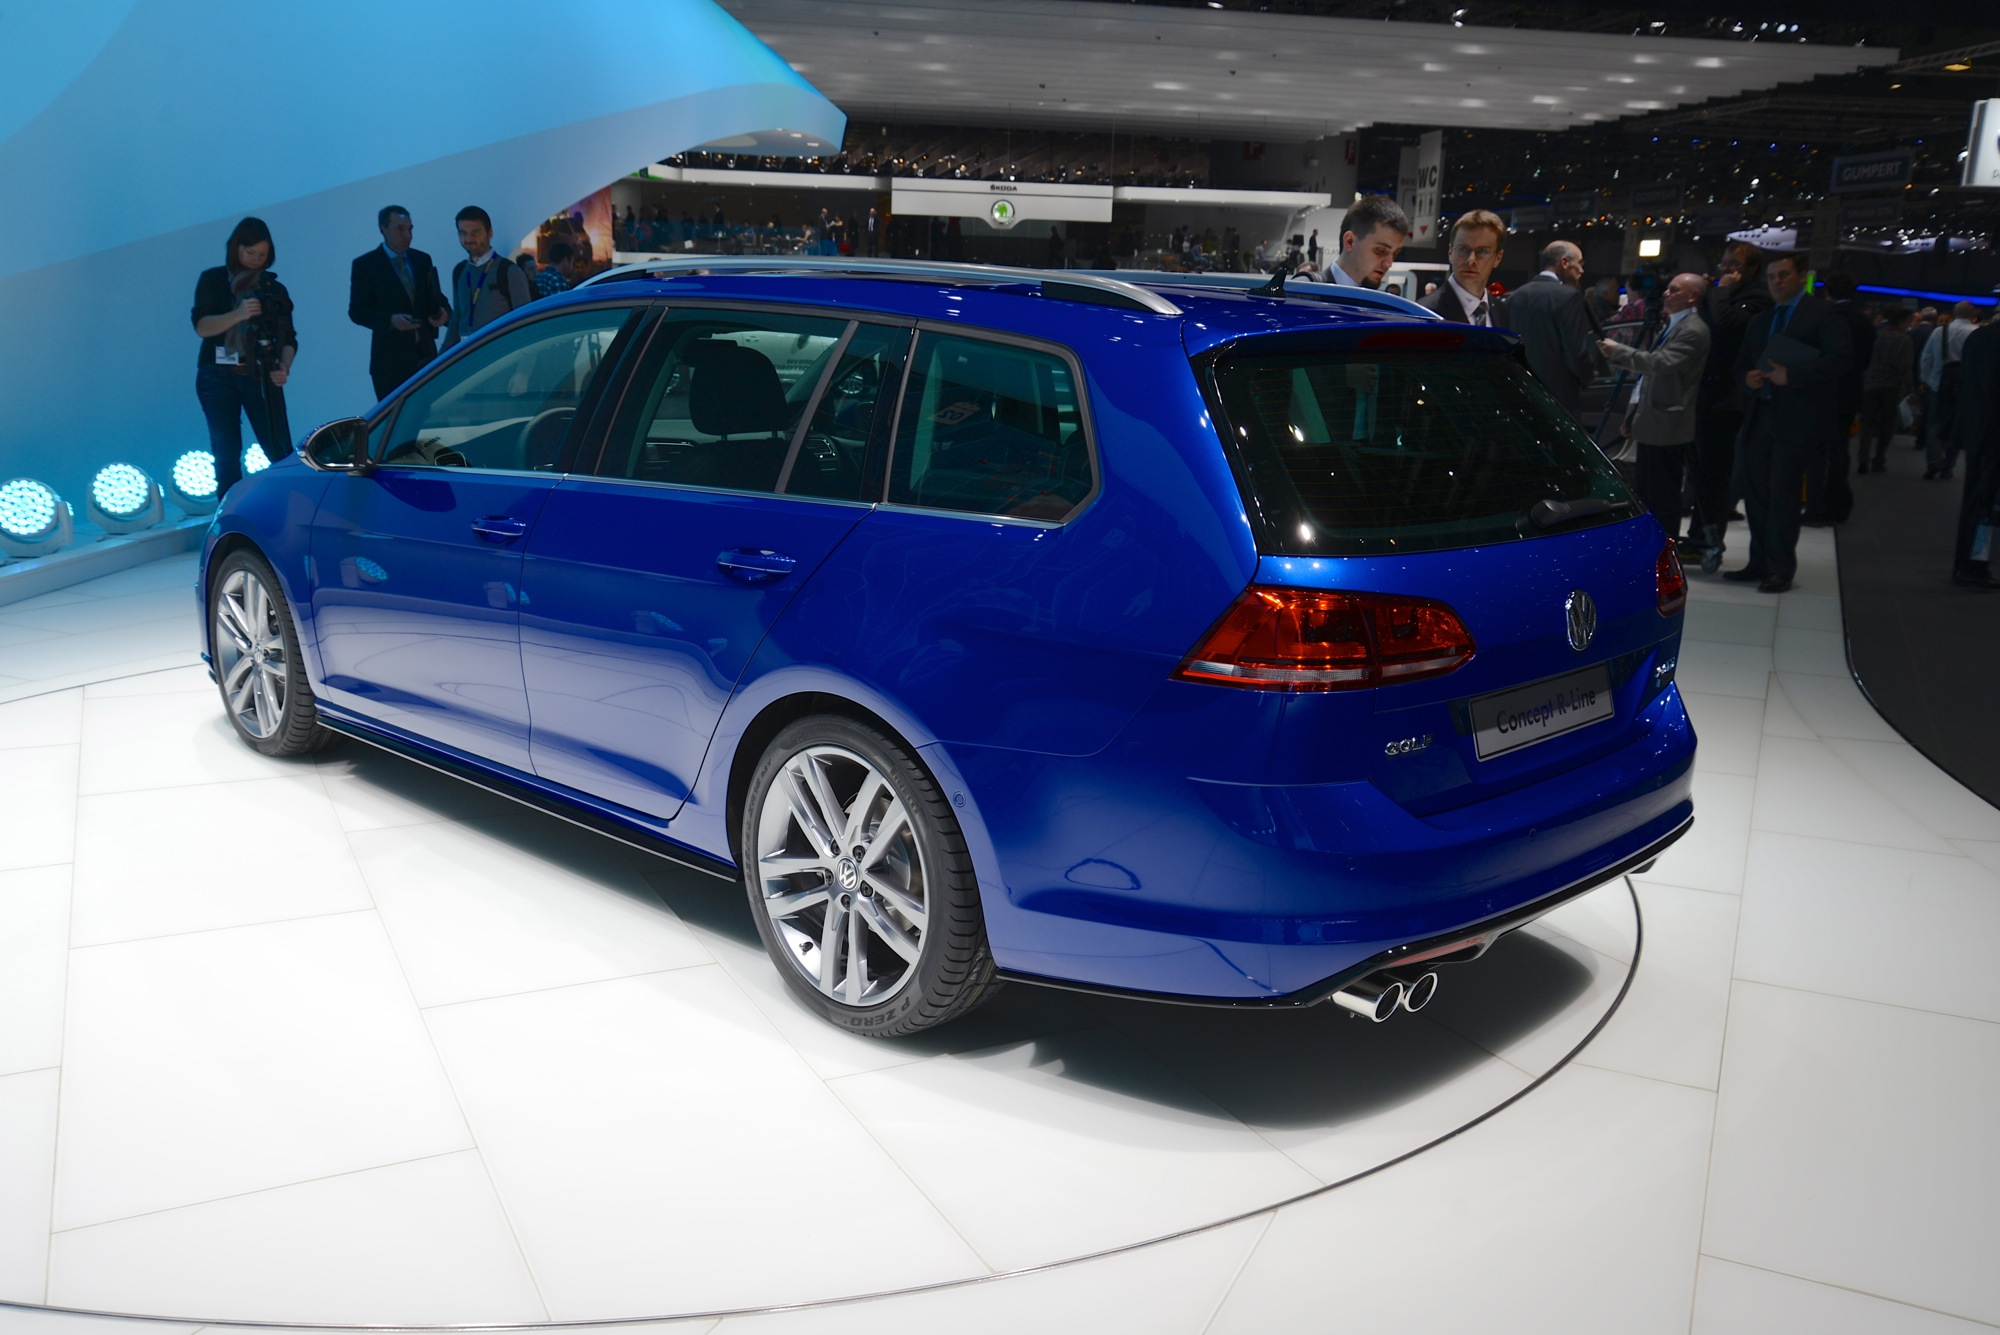 FormaCar: Volkswagen Golf Alltrack spied testing